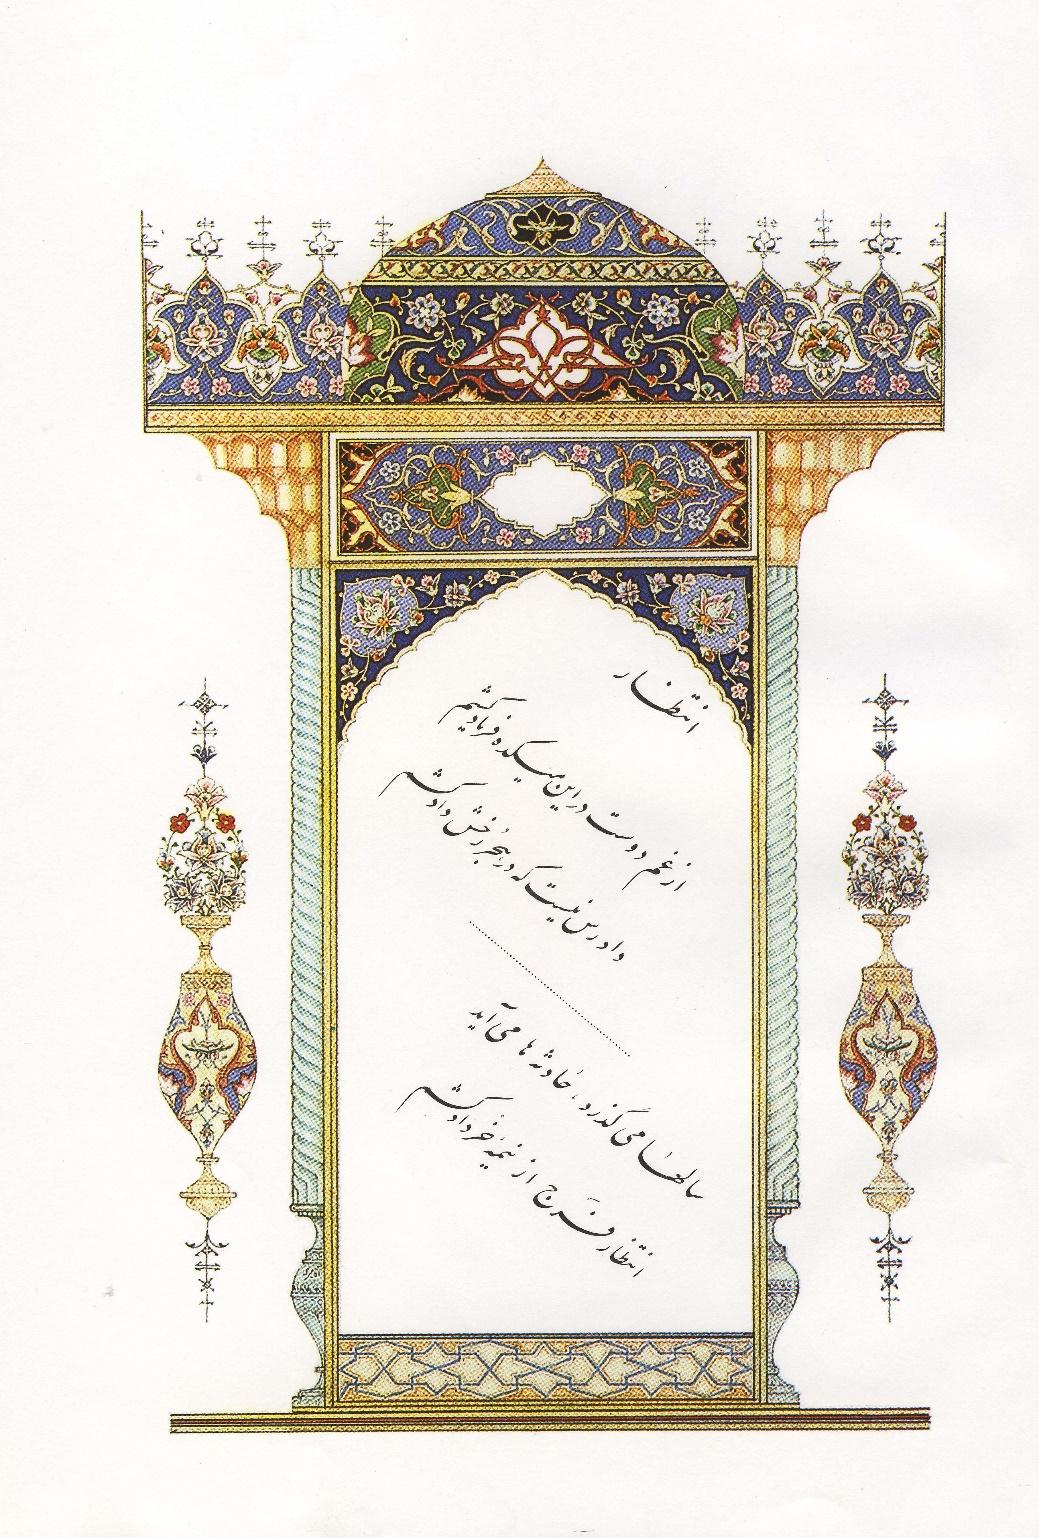 F:\f.khosravi\حوزه متن\دیوان امام مجموعه اشعار امام خمینی\Pages from b.120-n_Page_4.jpg